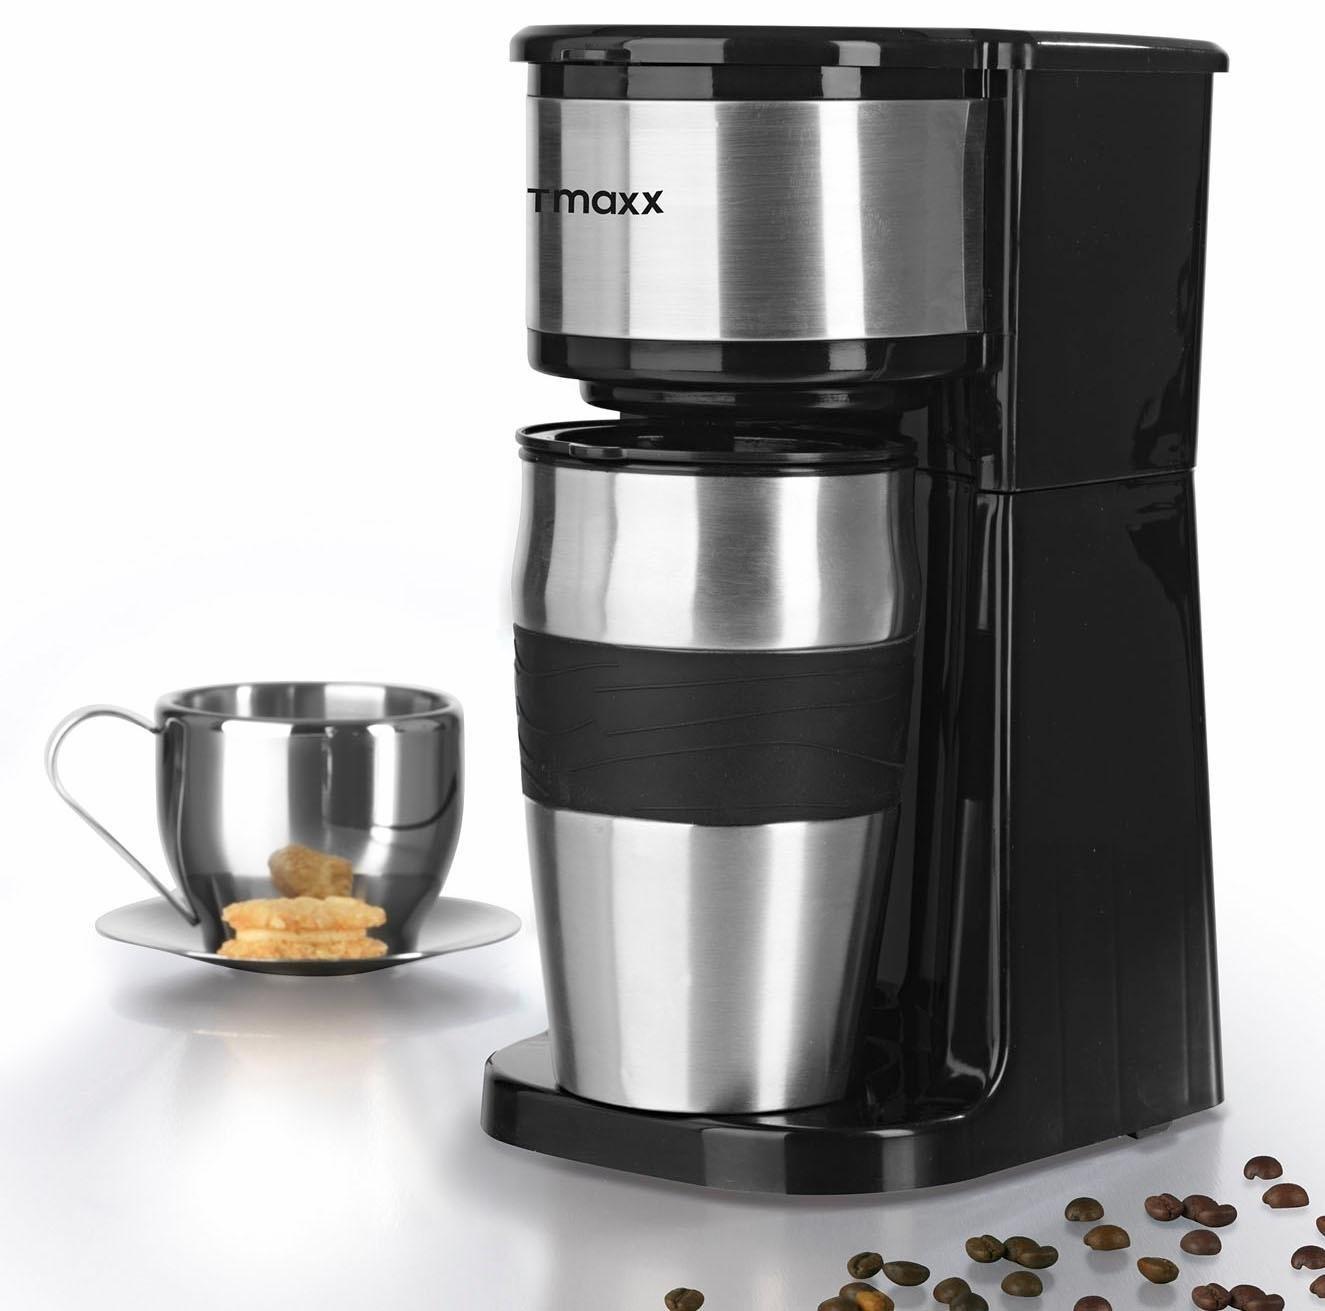 Gourmetmaxx koffiezetapparaat 6448 veilig op otto.nl kopen